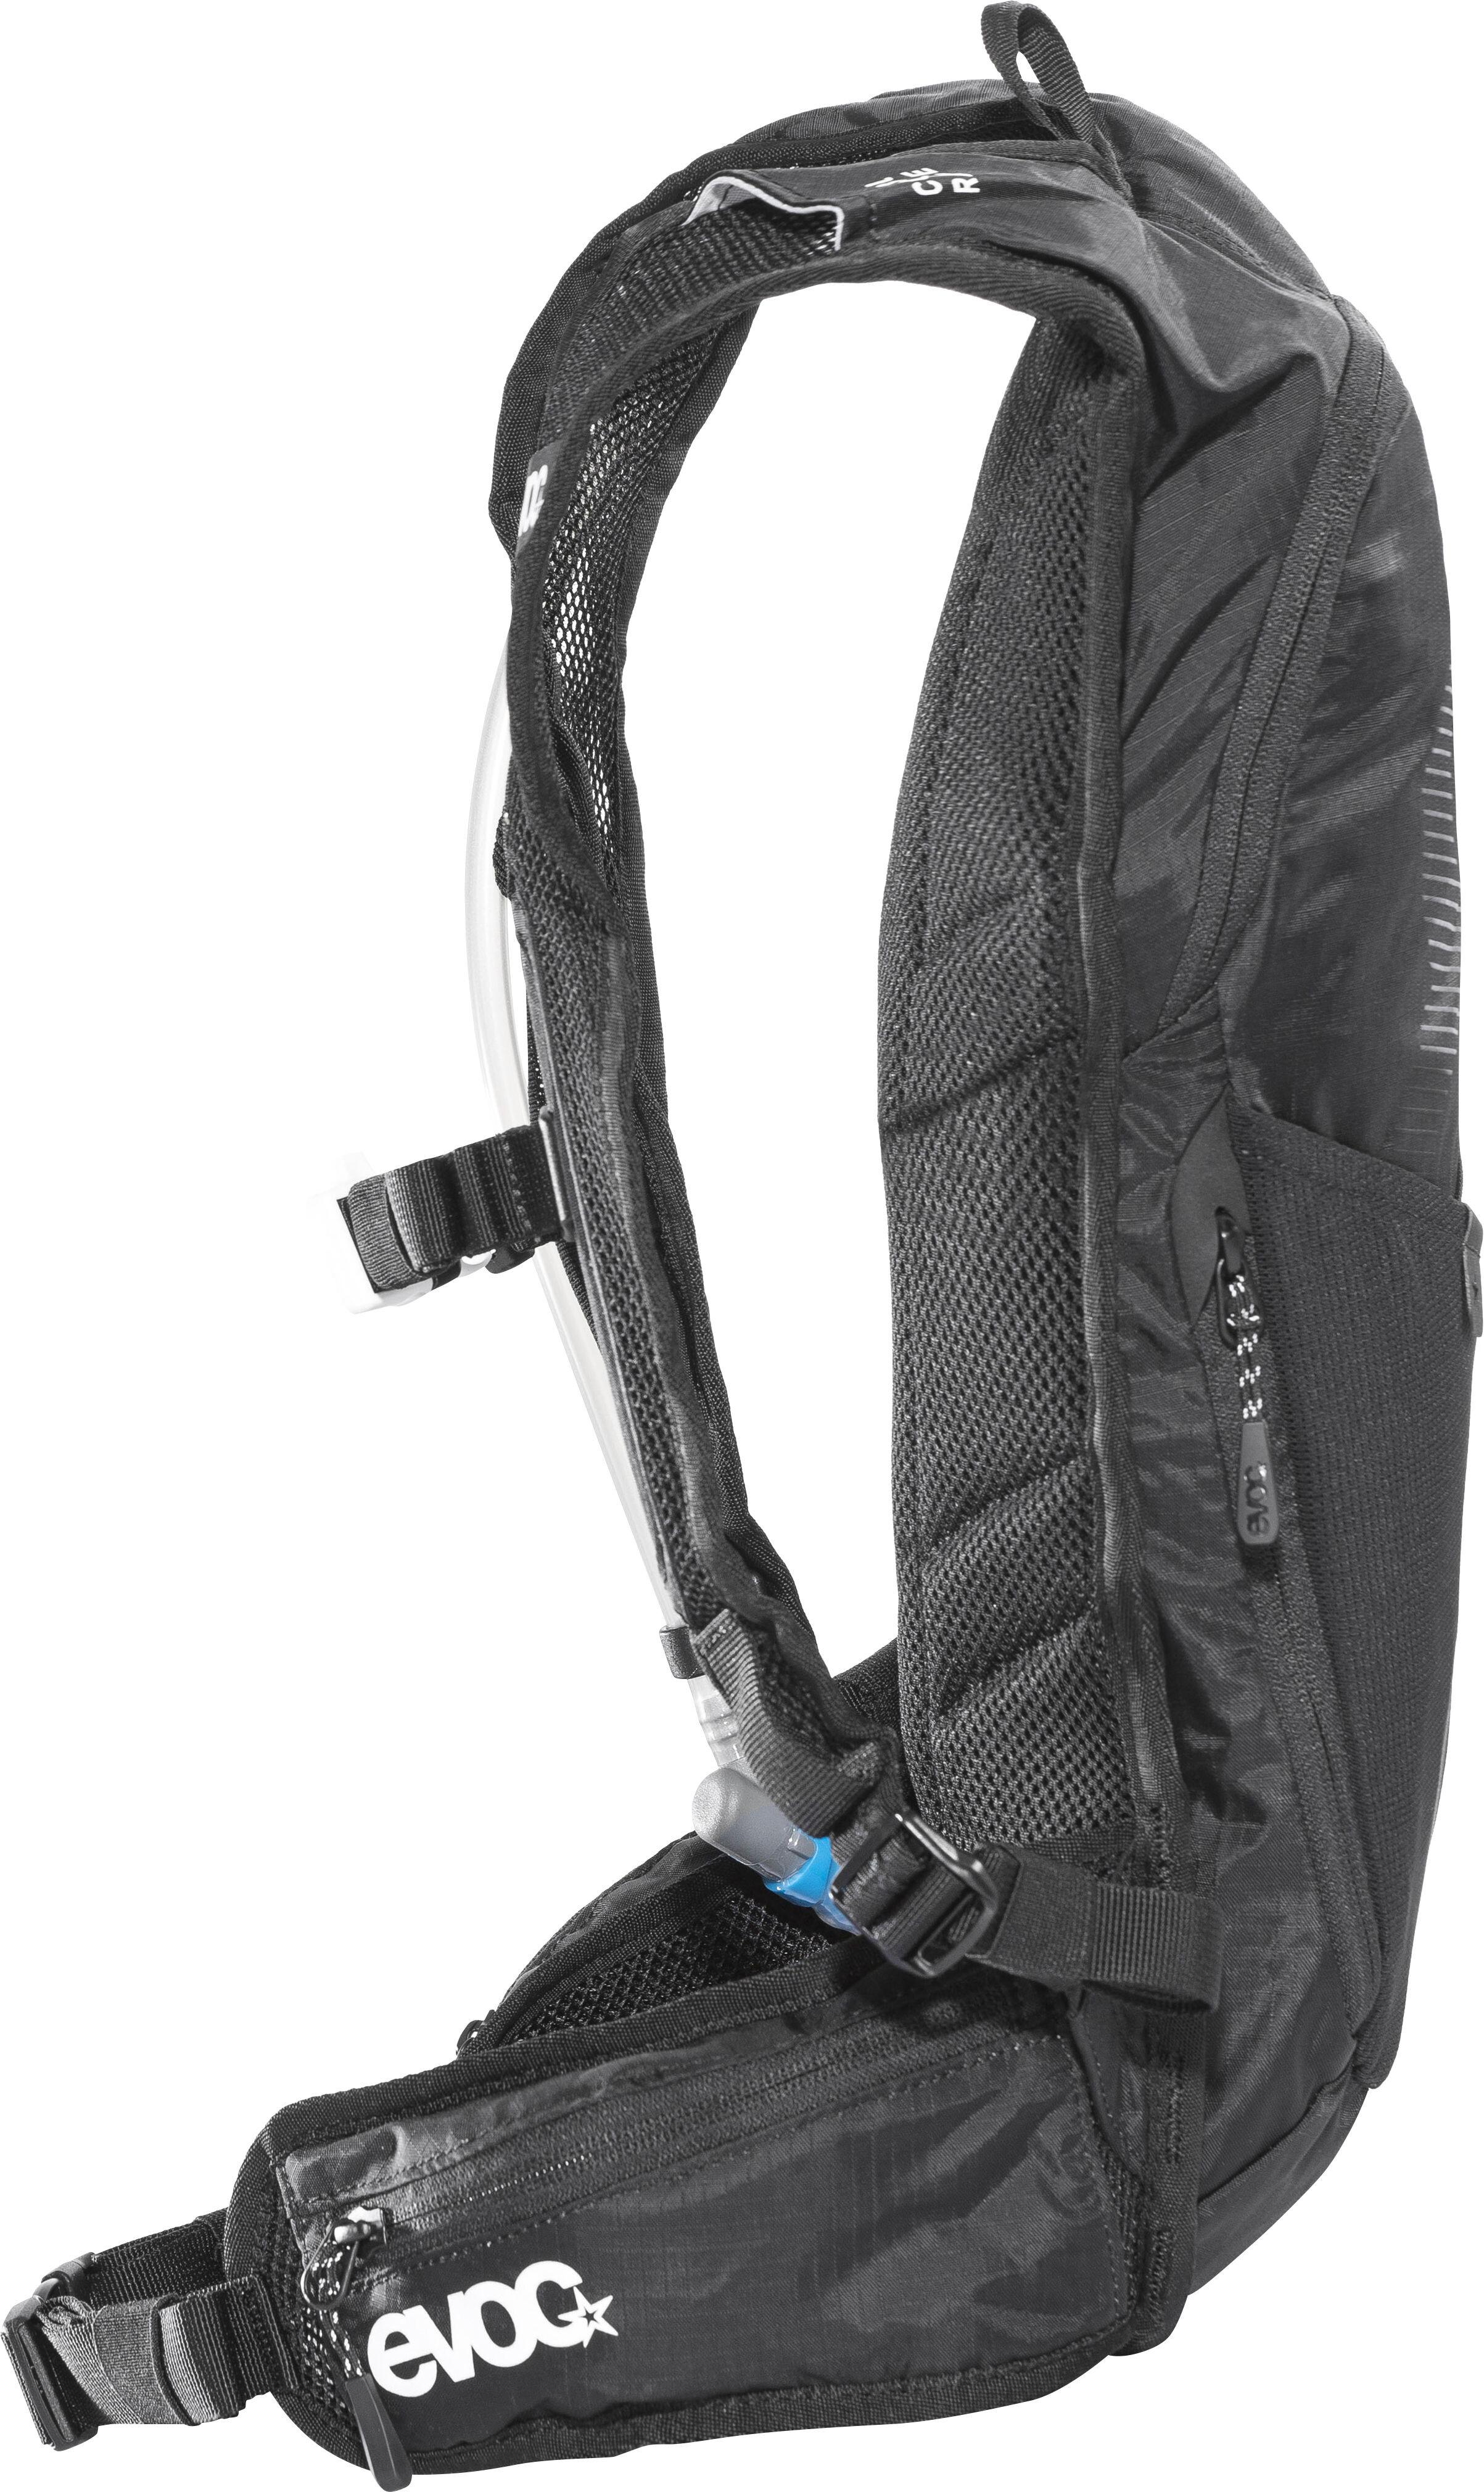 c8eafacf72605 EVOC CC Race Backpack 3l + 2l Bladder black at Bikester.co.uk